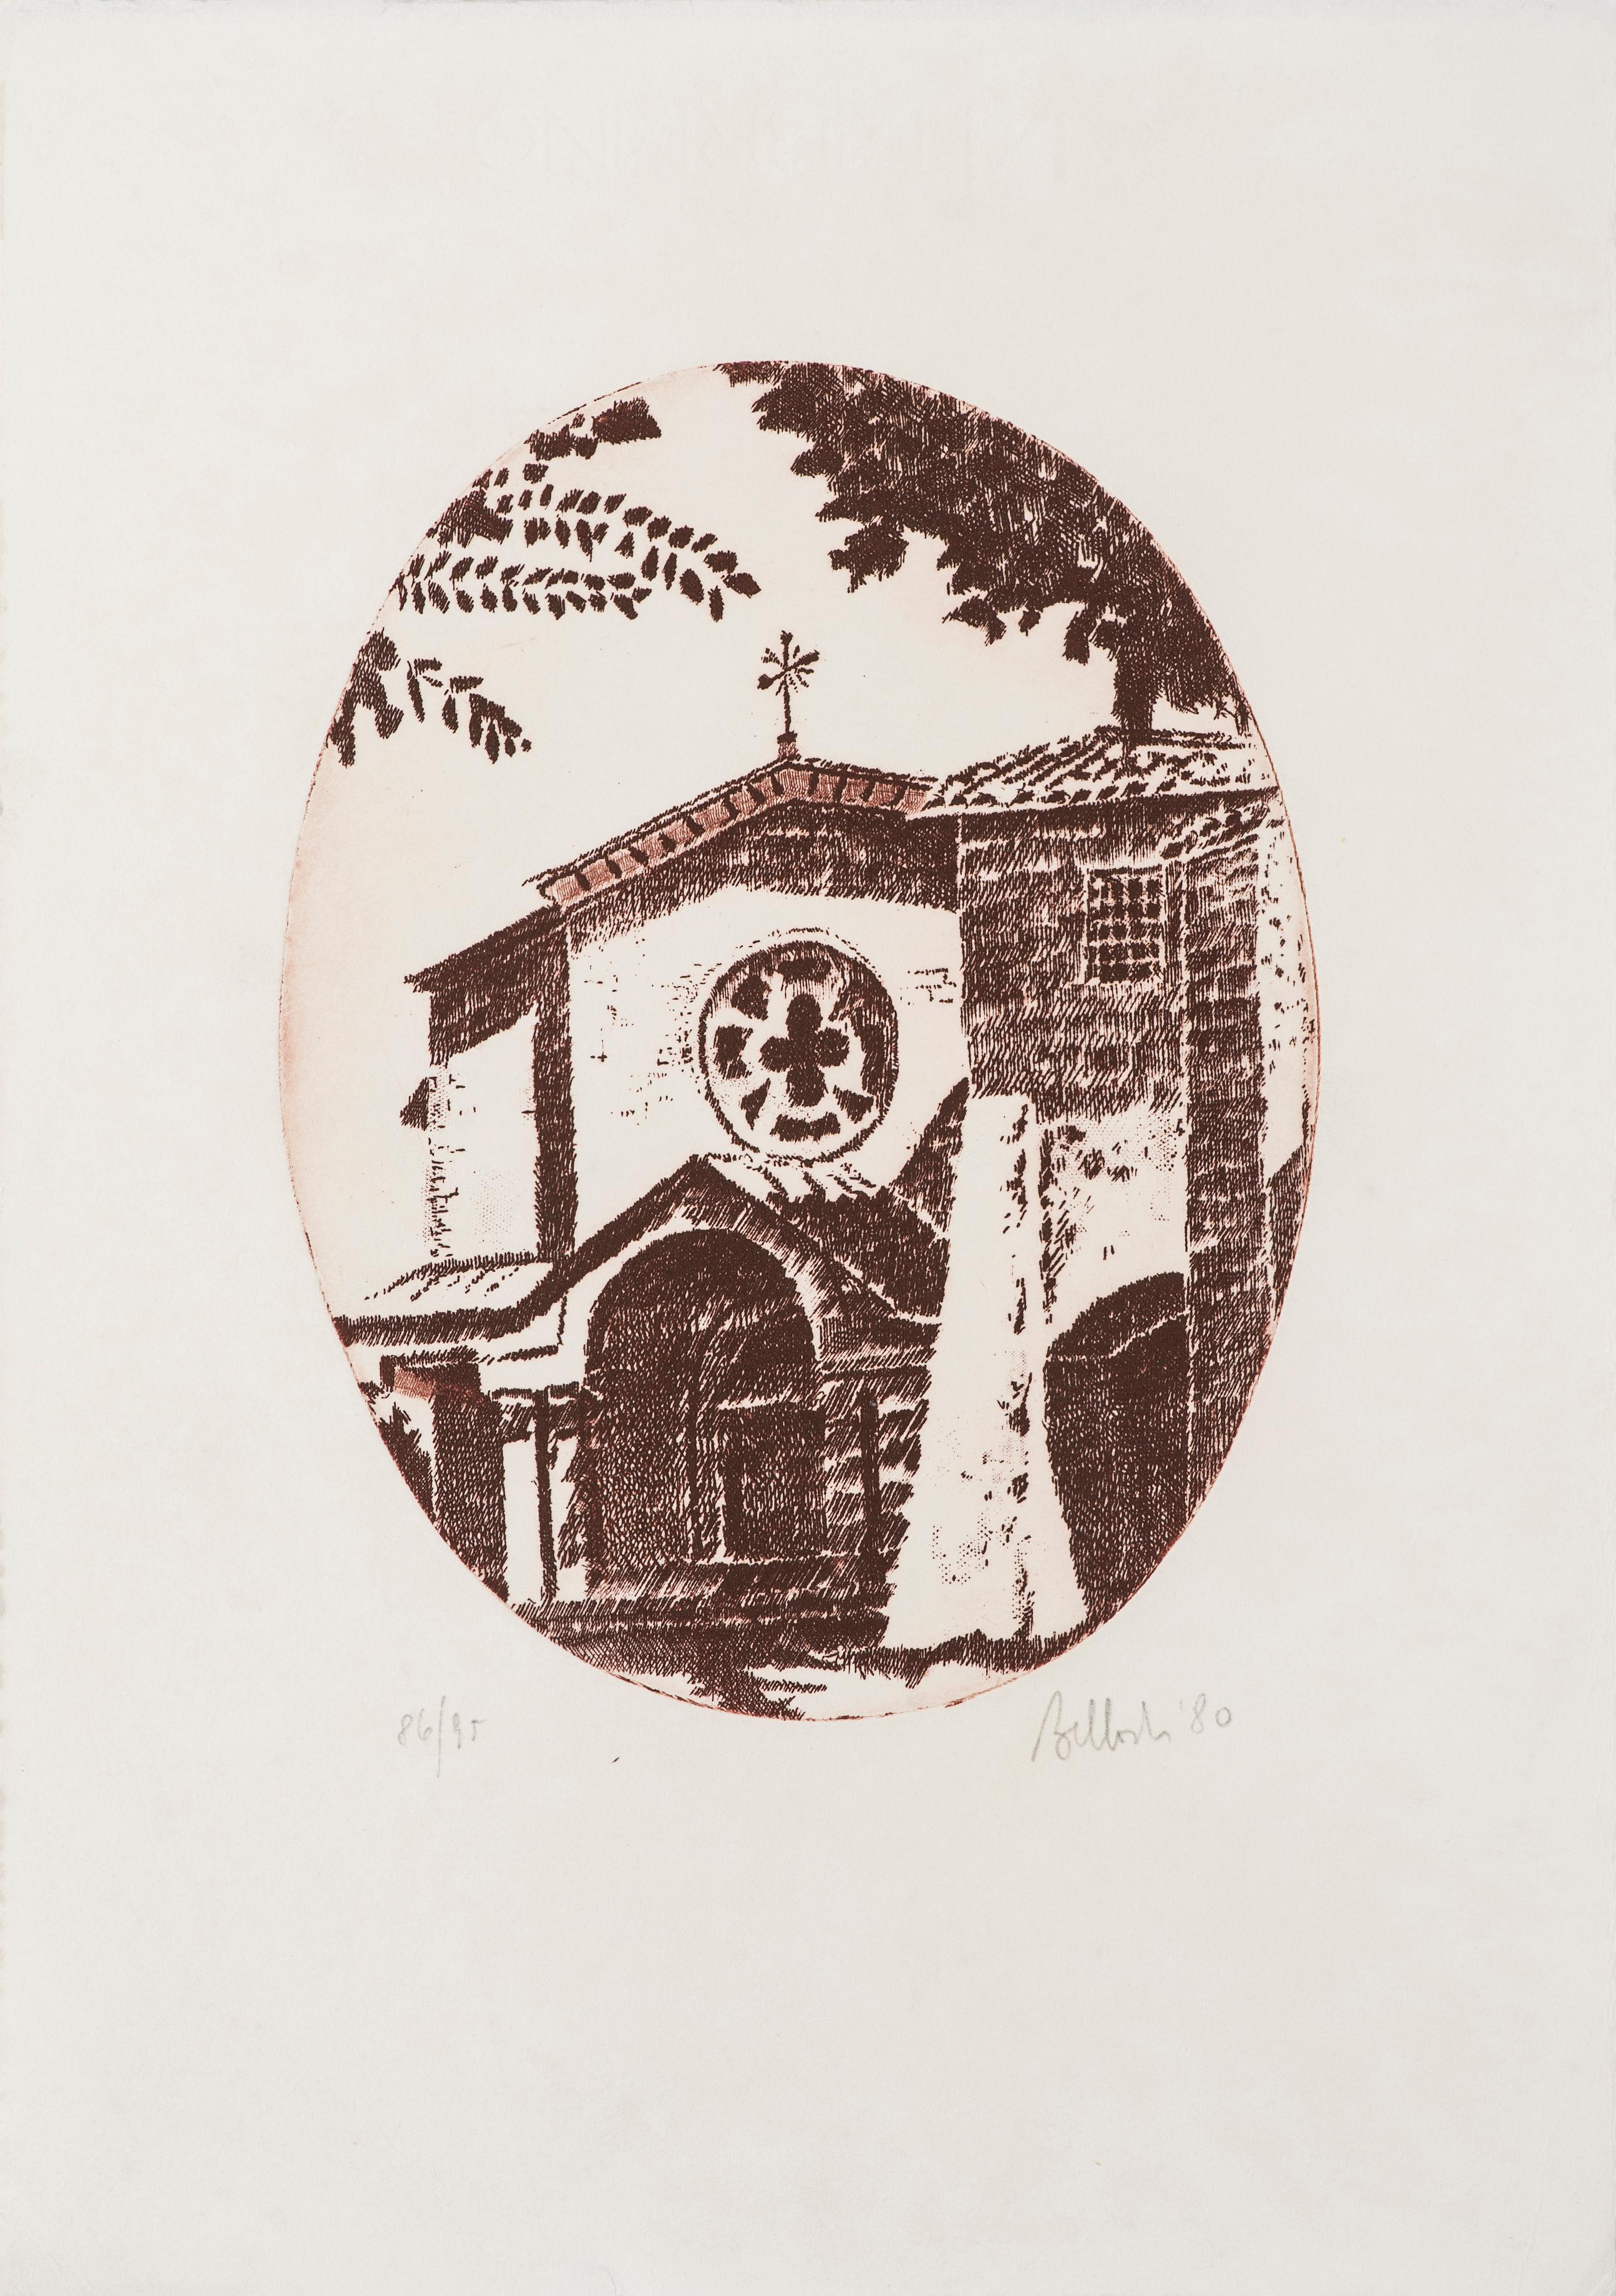 The Church - Original Etching by Riccardo Tommasi Ferroni - 1980